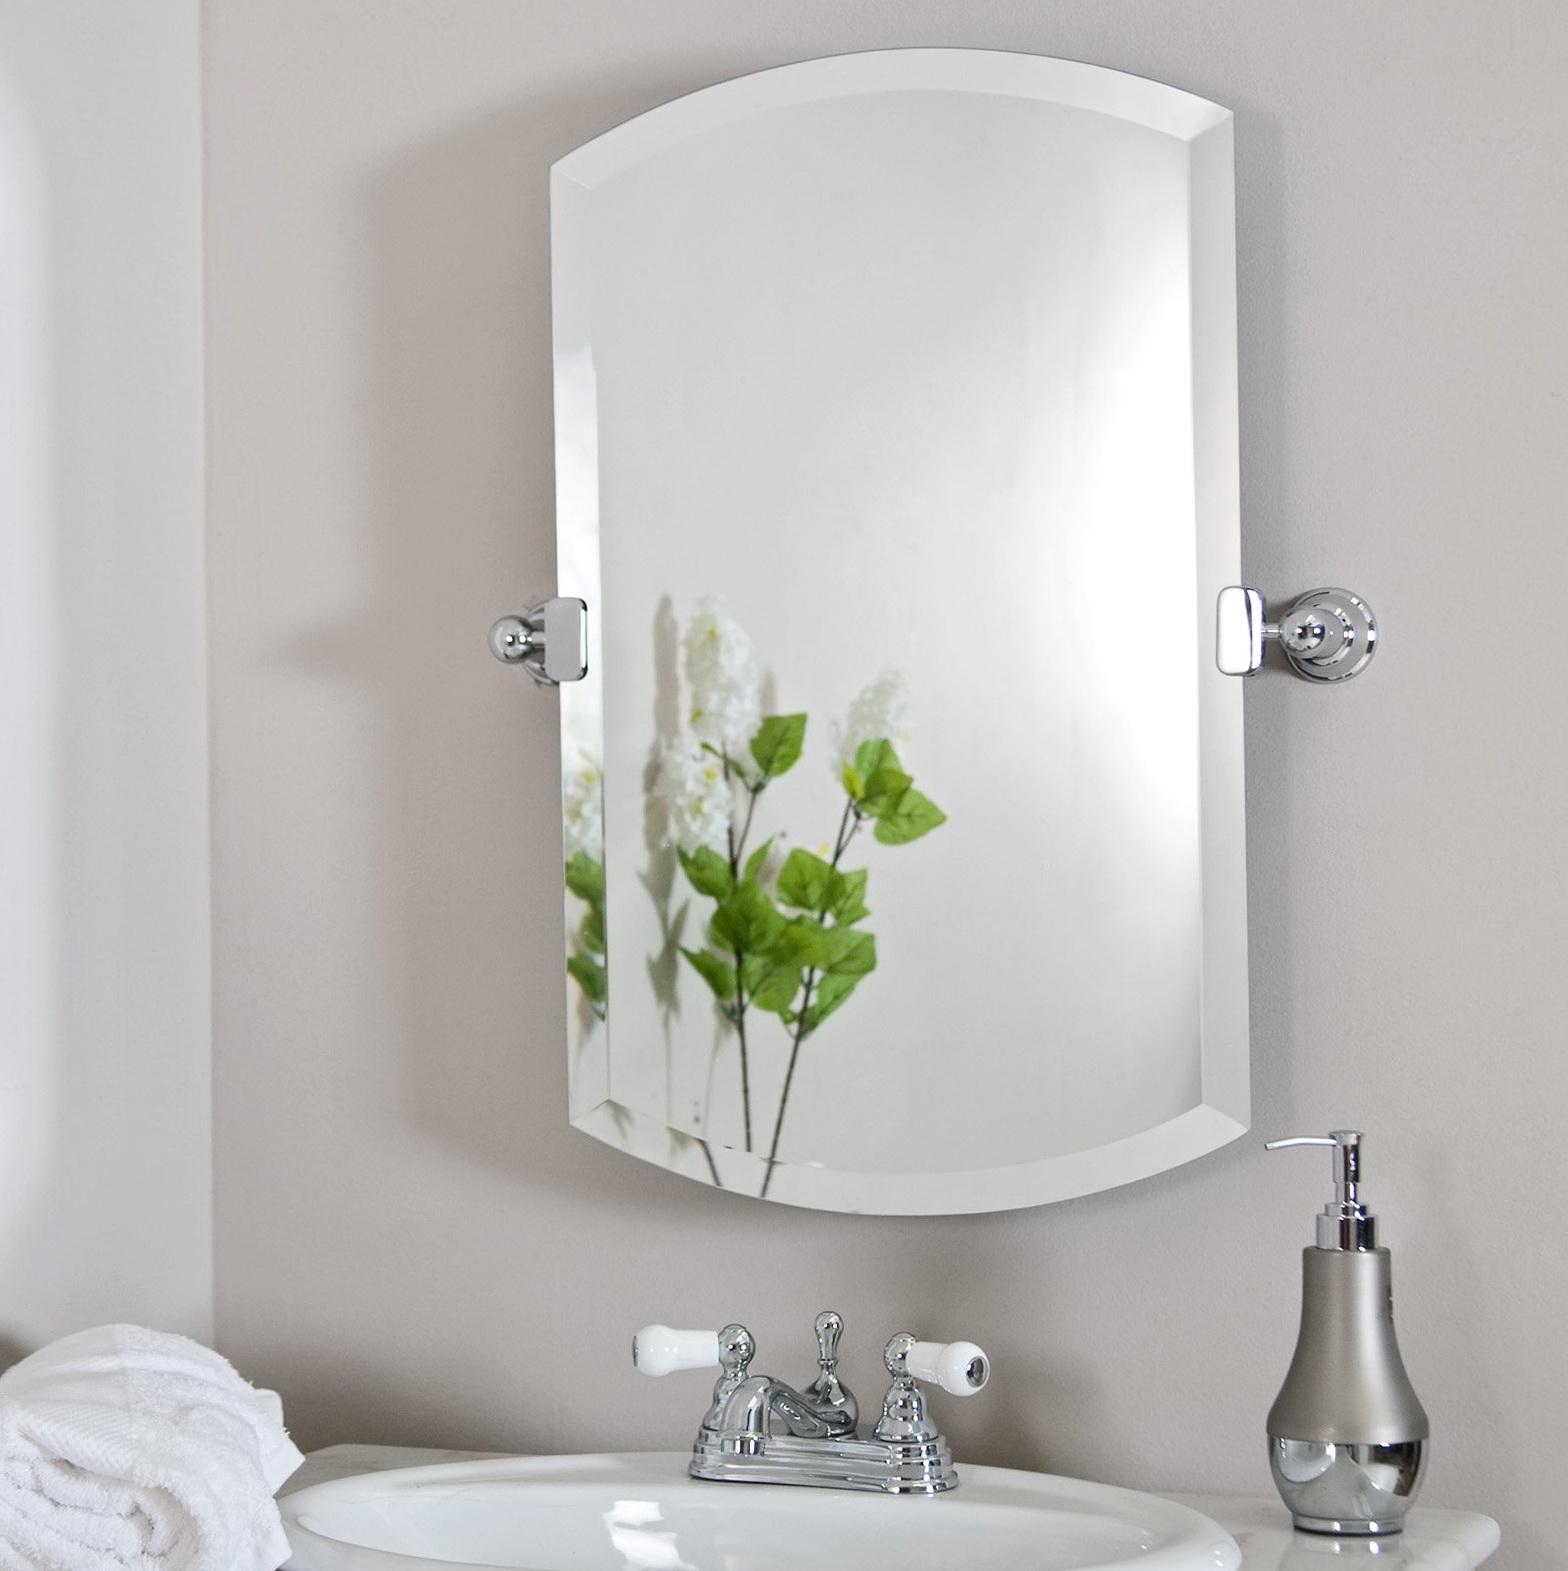 Unique Bathroom Mirrors For Sale